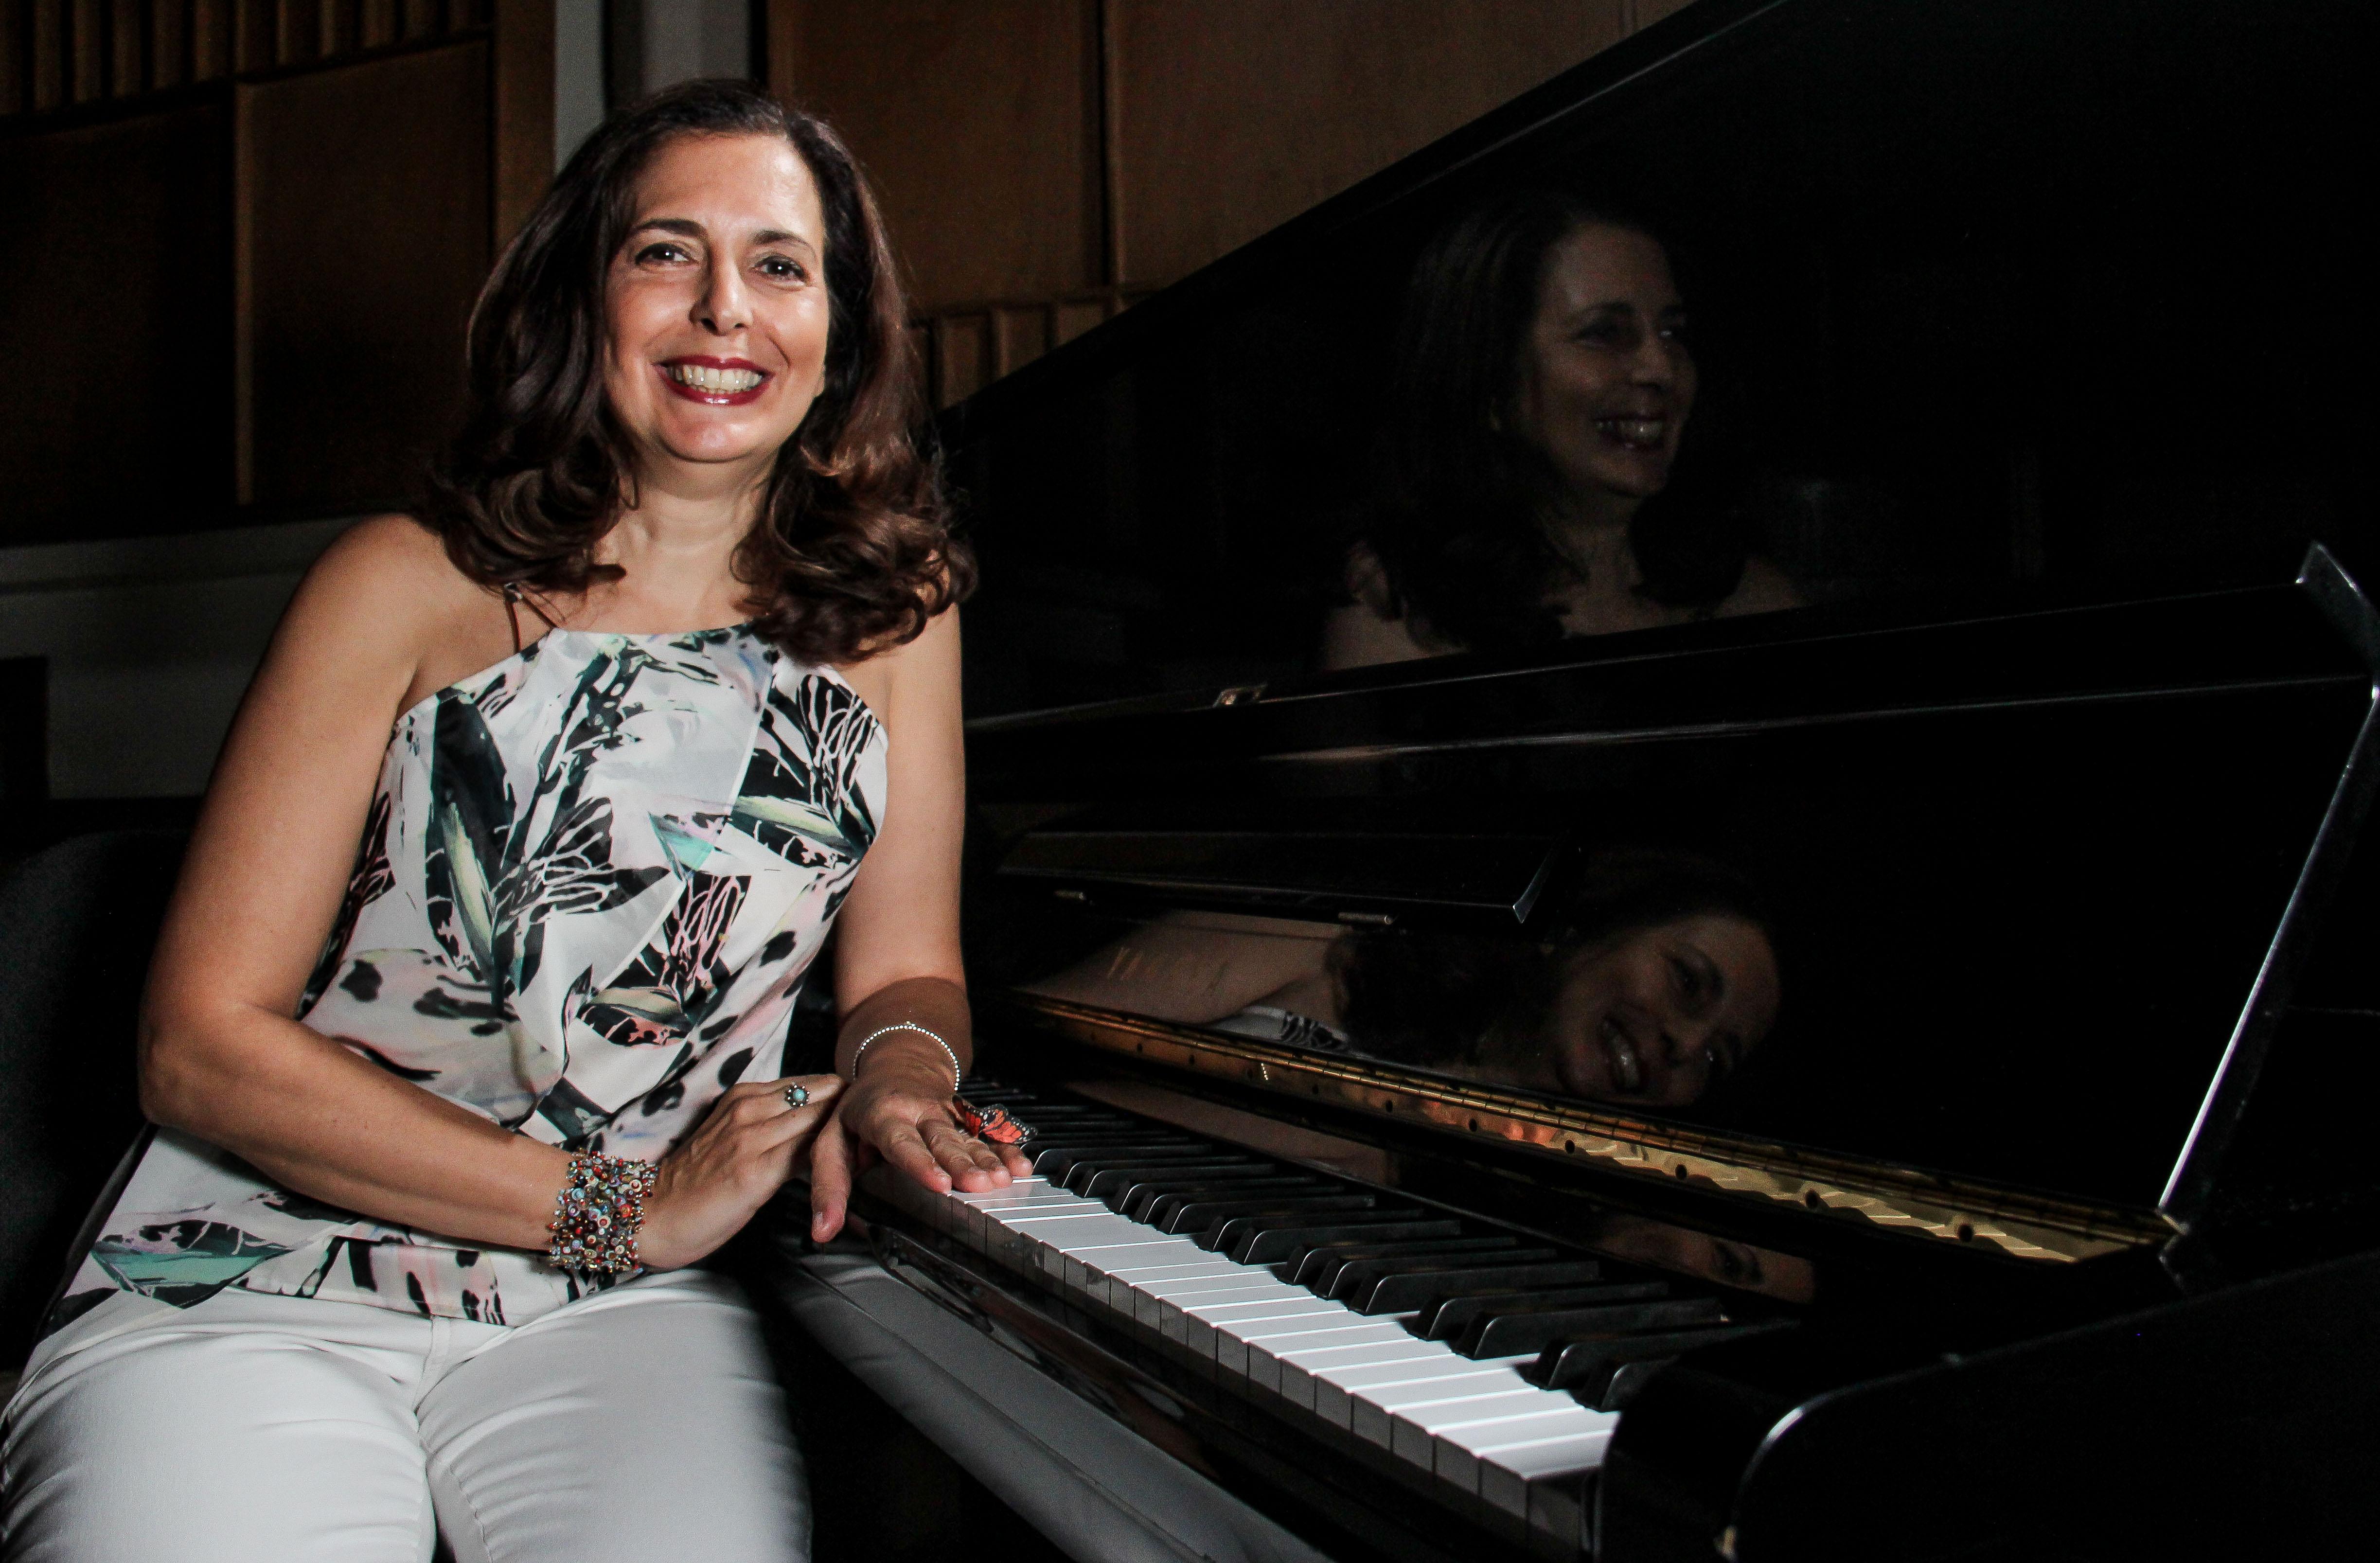 Clara Rodríguez Cumple Su Anhelo De Interpretar Una Obra Atrevida De Maurice Ravel